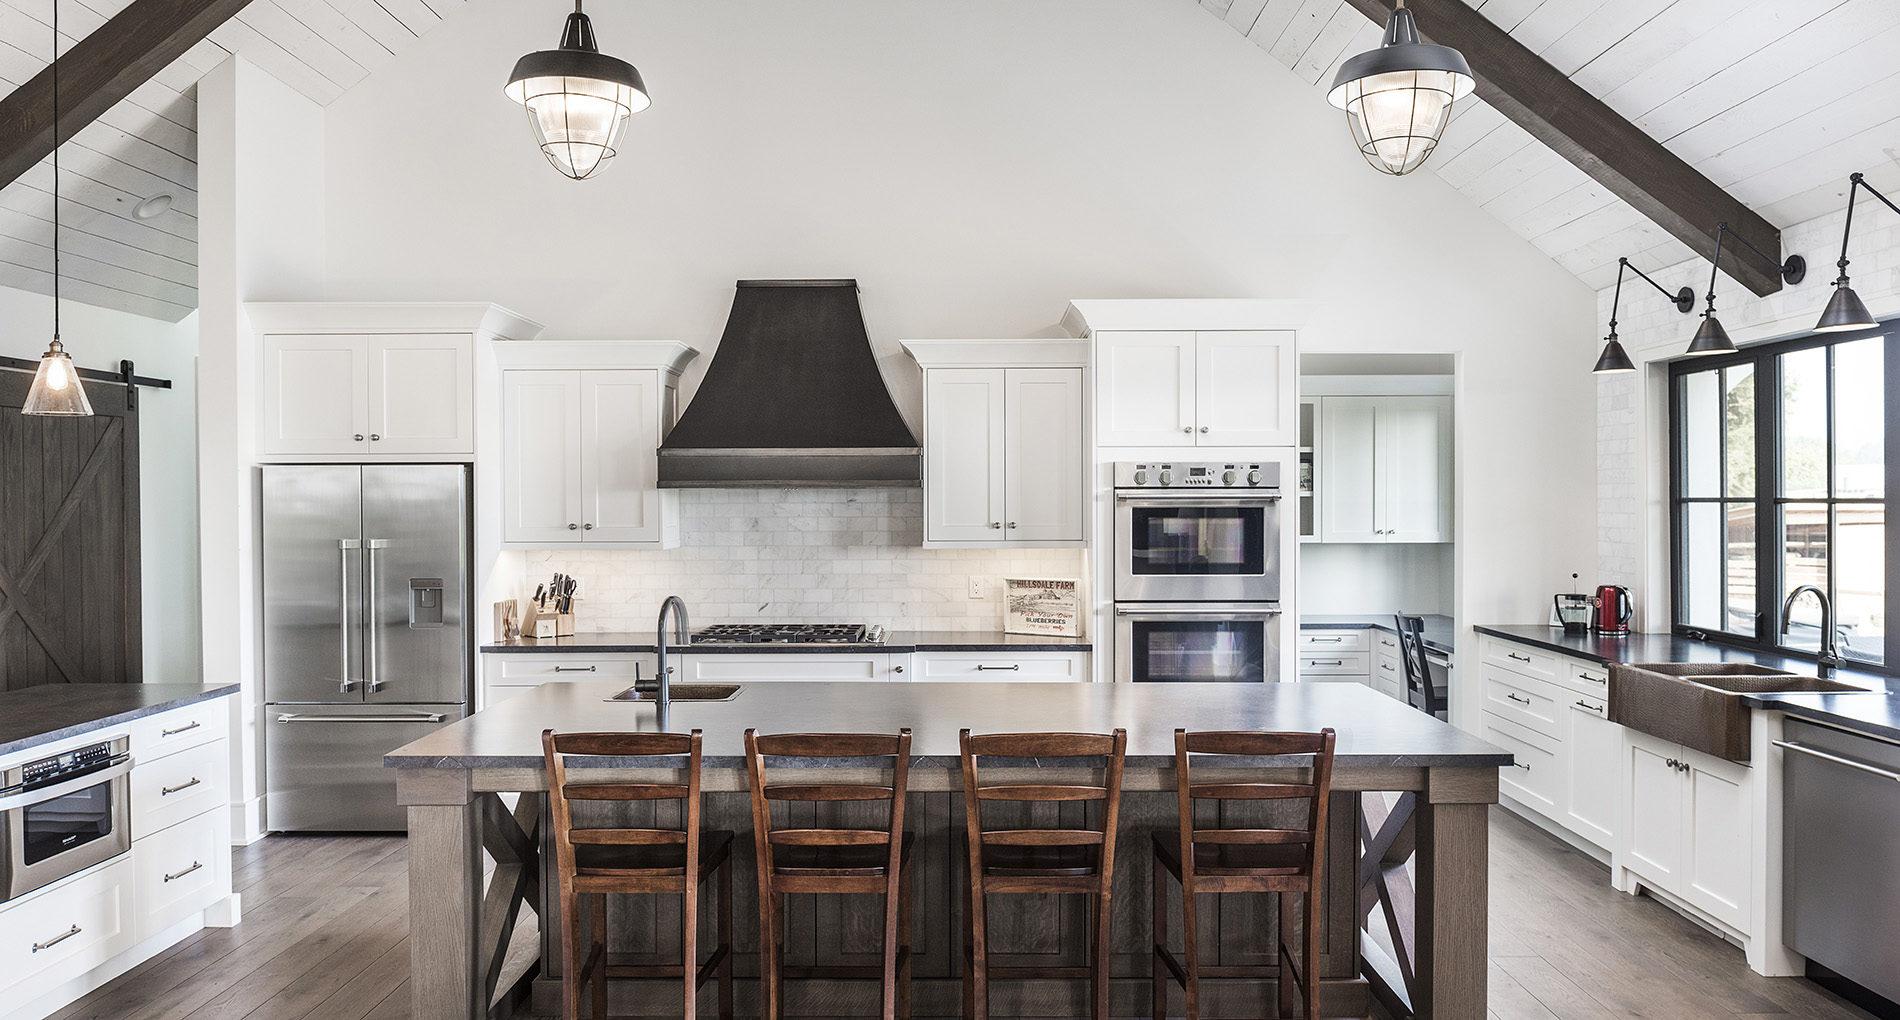 Kitchen Renovation Mapleridge Adamsroad Slider